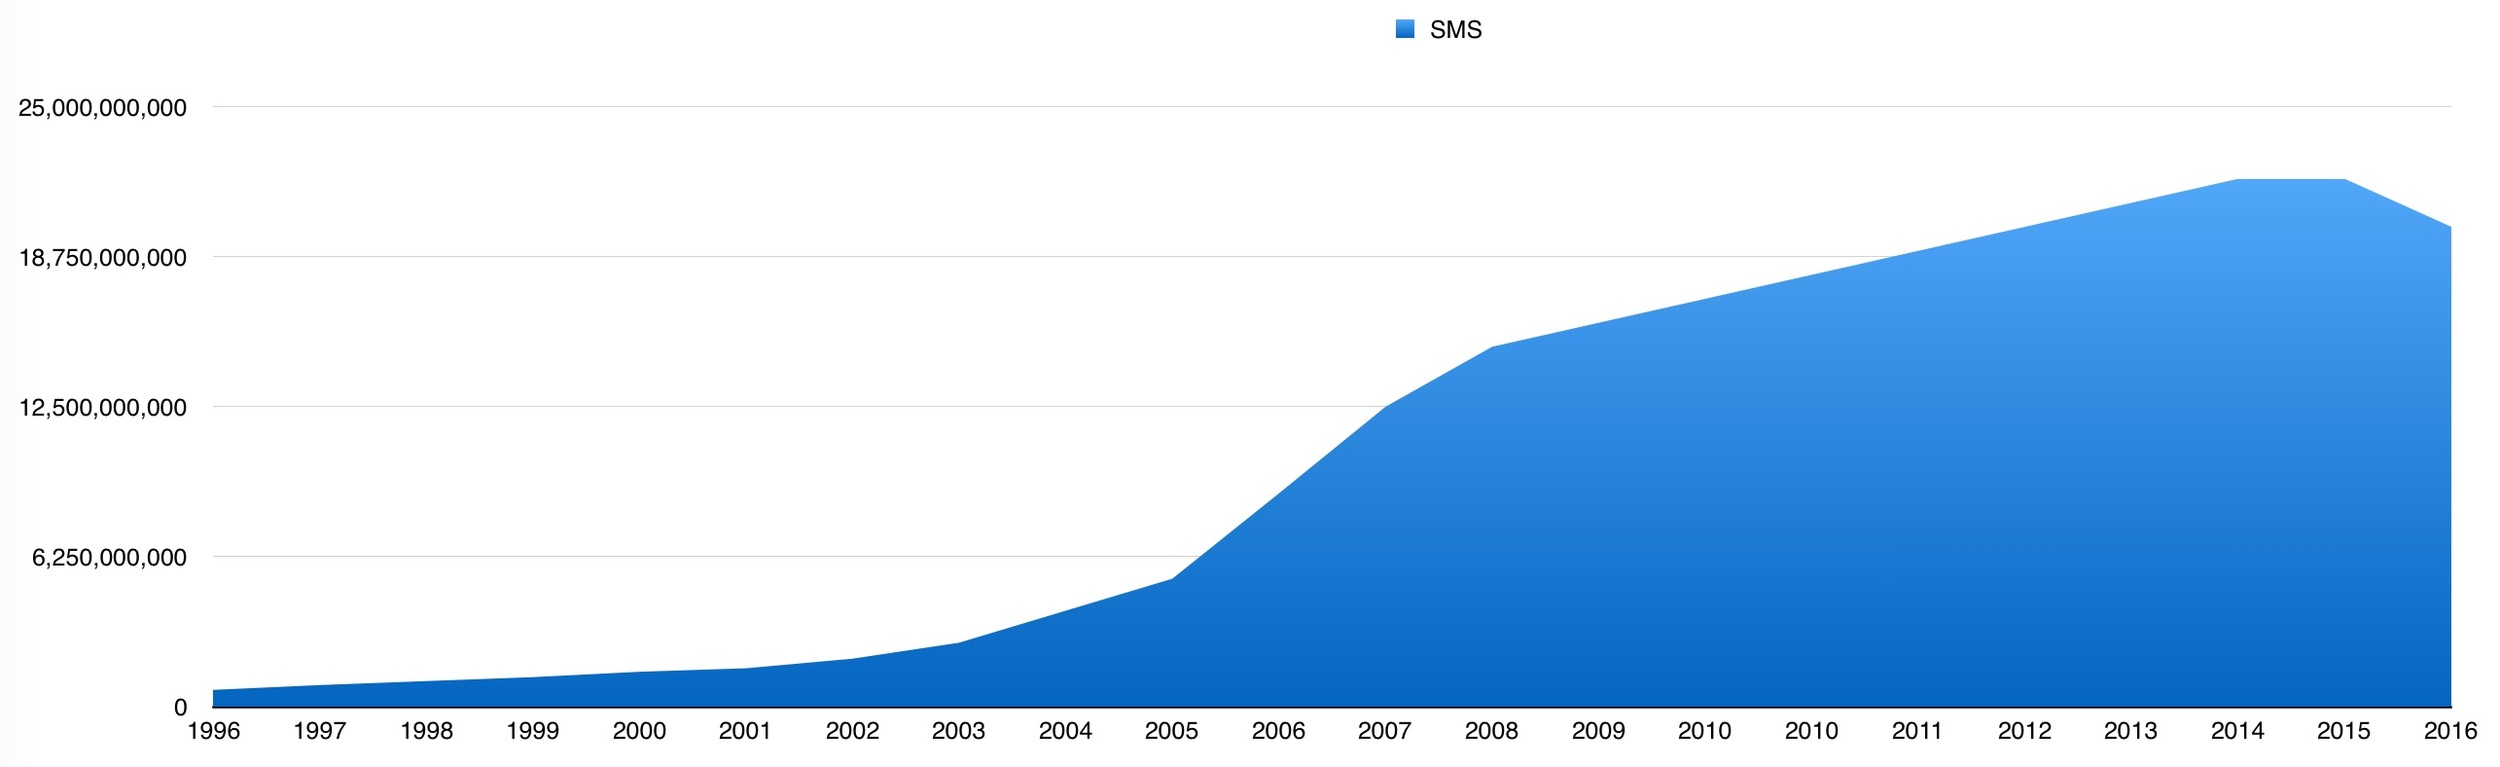 Worldwide SMS usage hits peak usage in 2015......